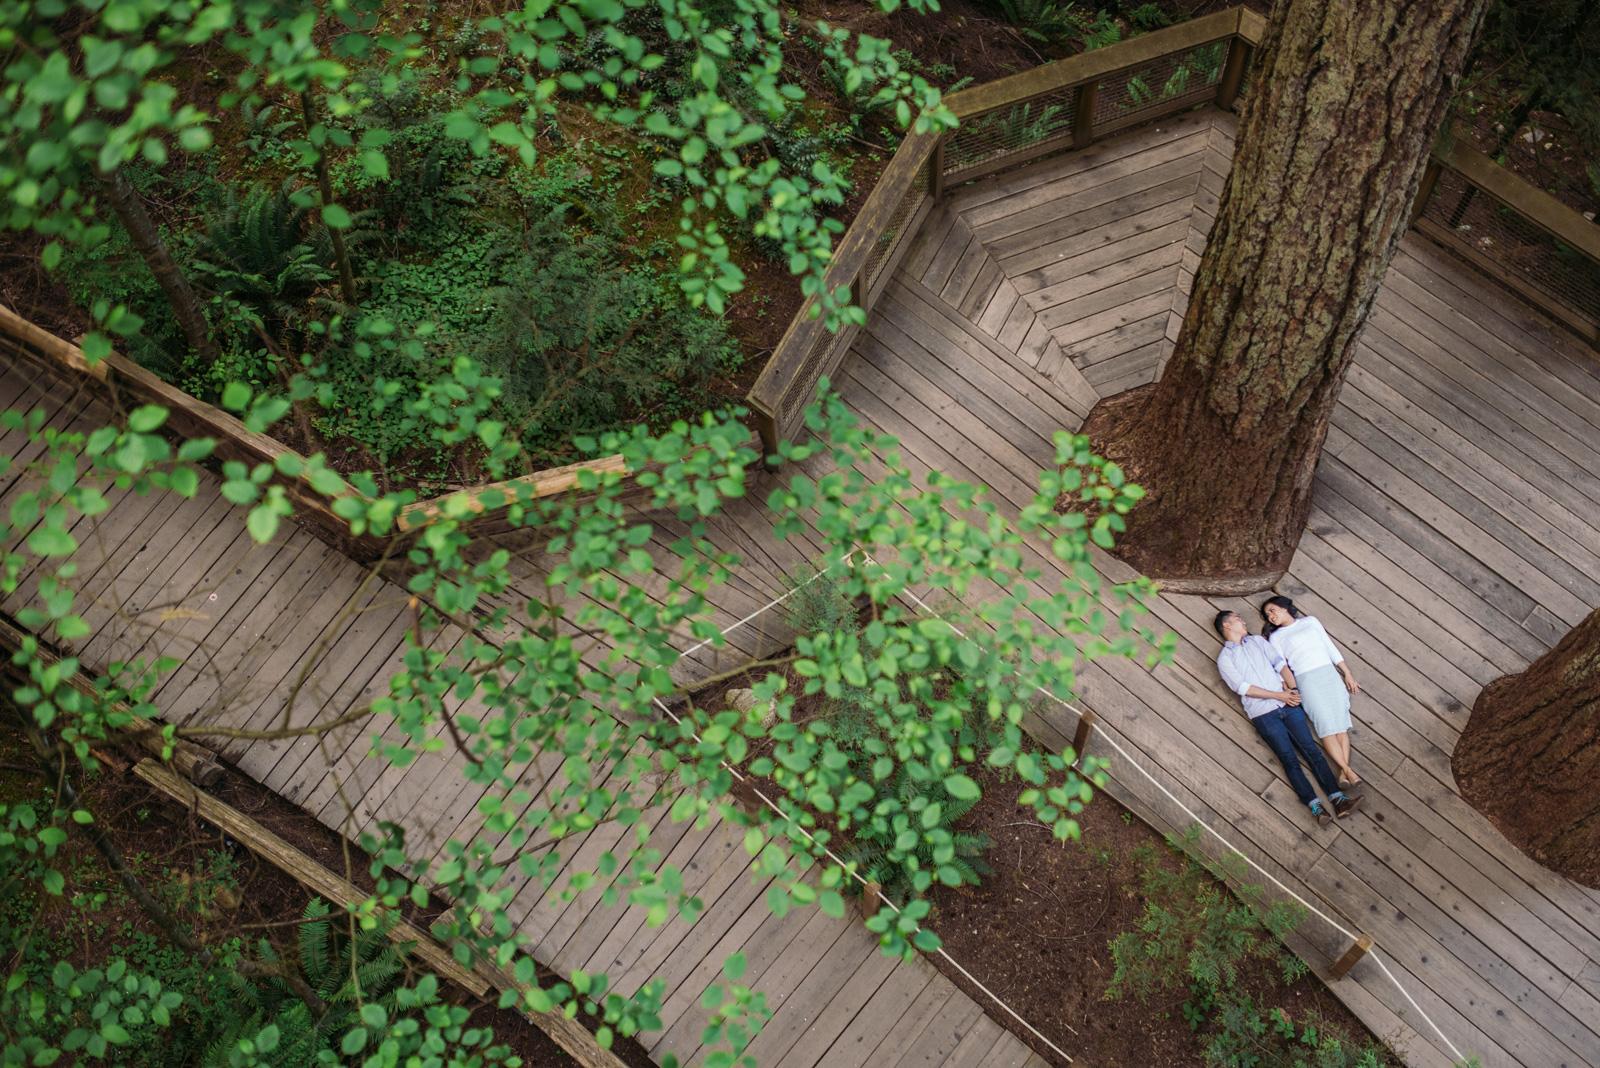 vancouver-island-wedding-photographers-capilano-suspension-bridge-engagement-17.jpg